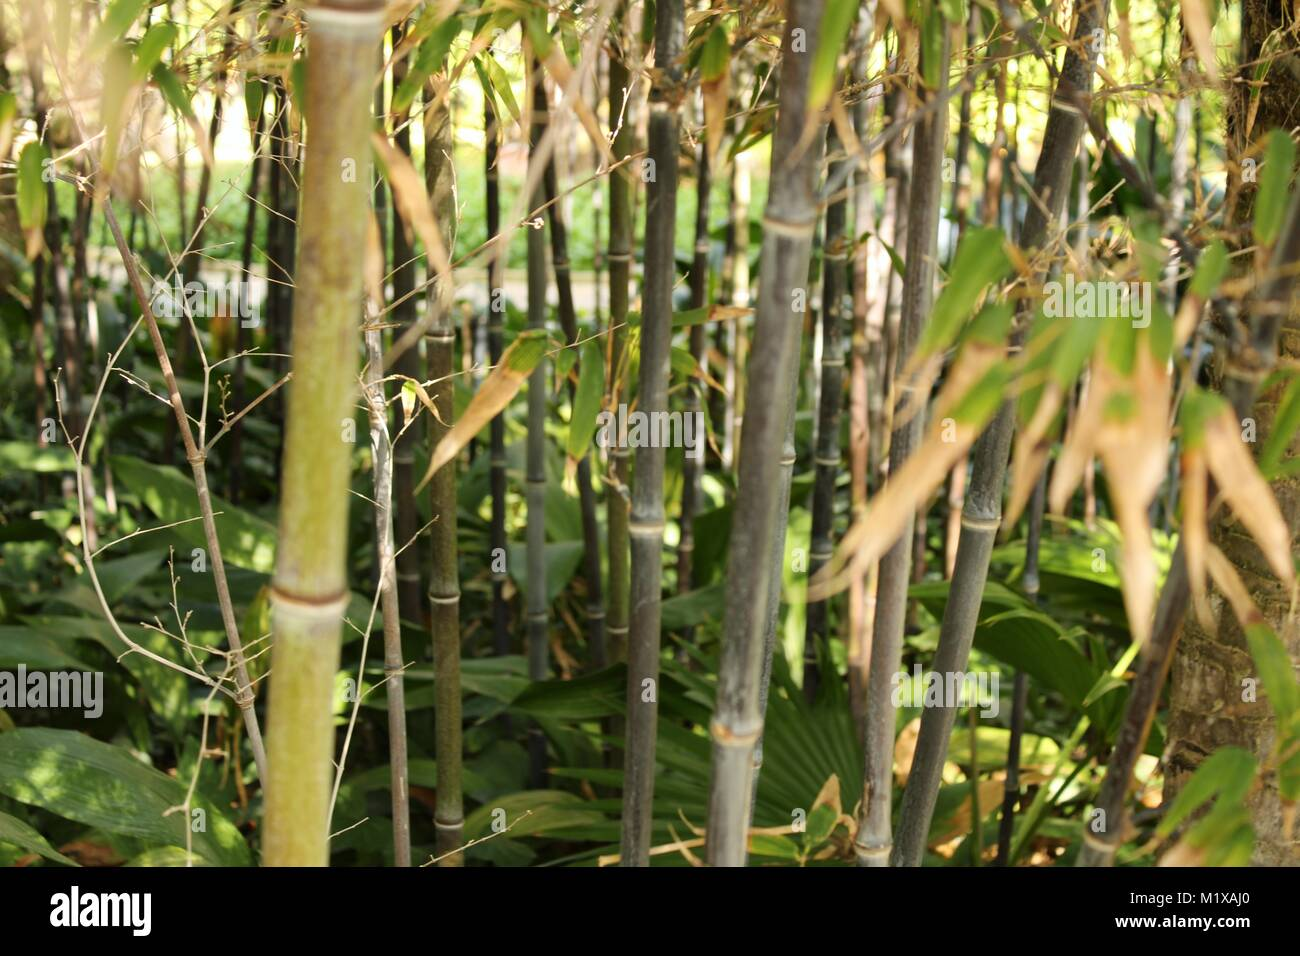 Phyllostachys Nigra Schwarzer Bambus Im Garten Stockfoto Bild